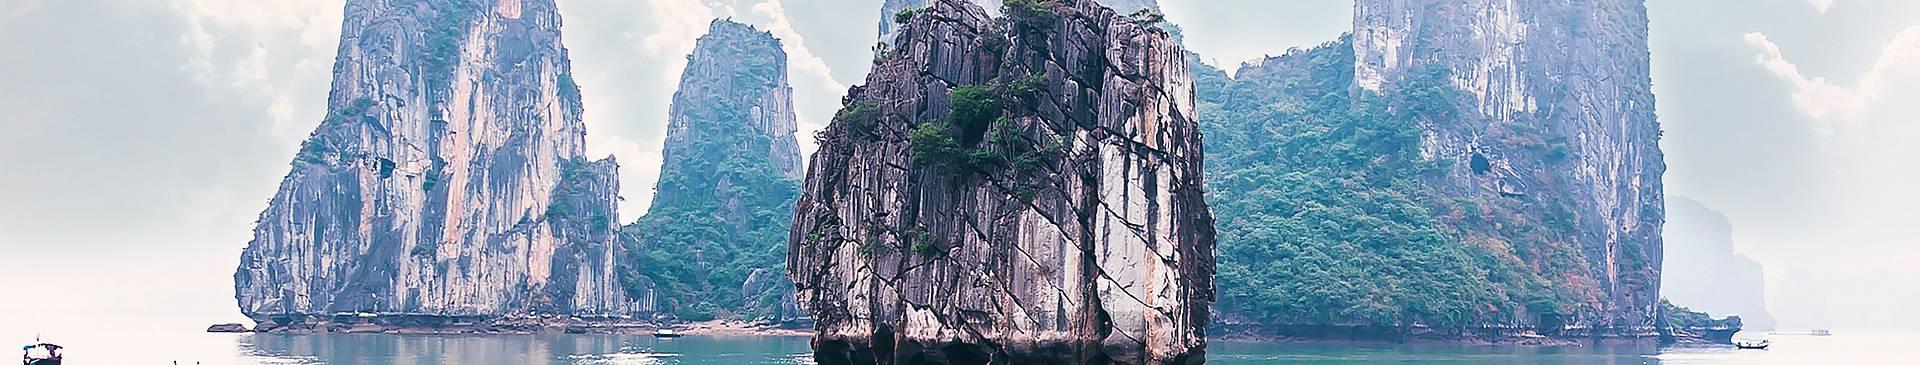 Summer in Vietnam